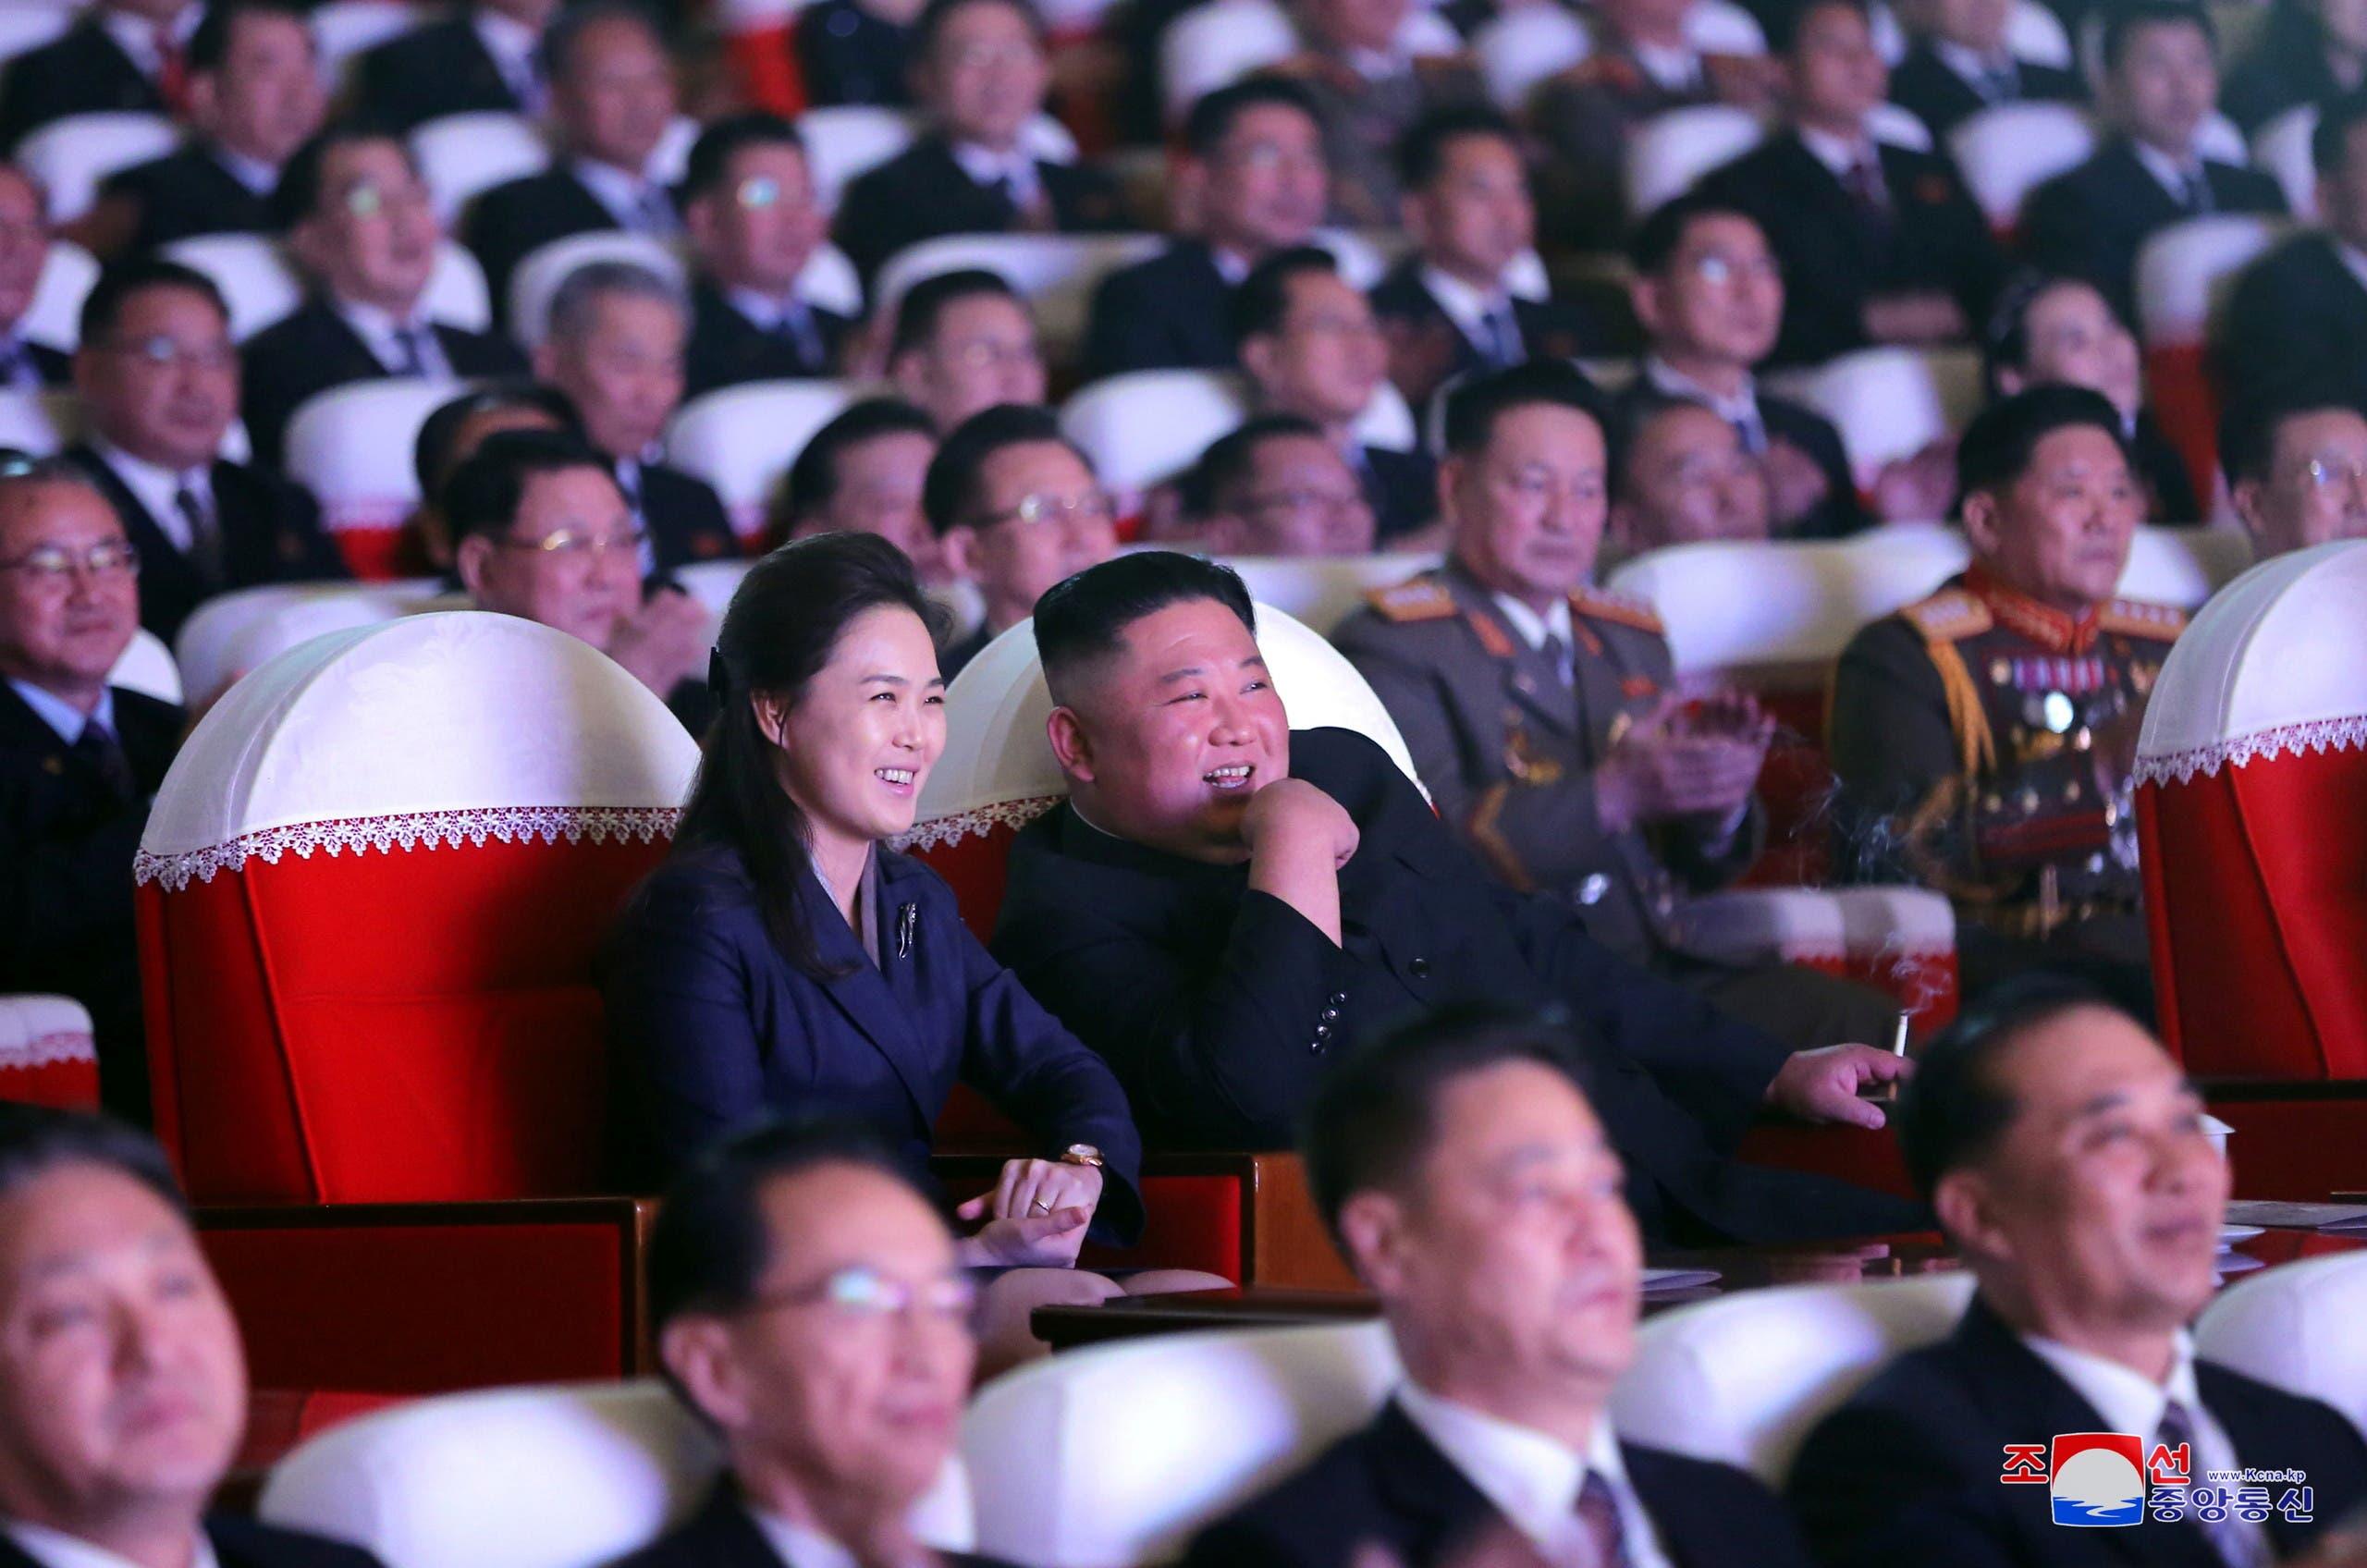 ري سول جو وكيم يونغ أون خلال الحفل